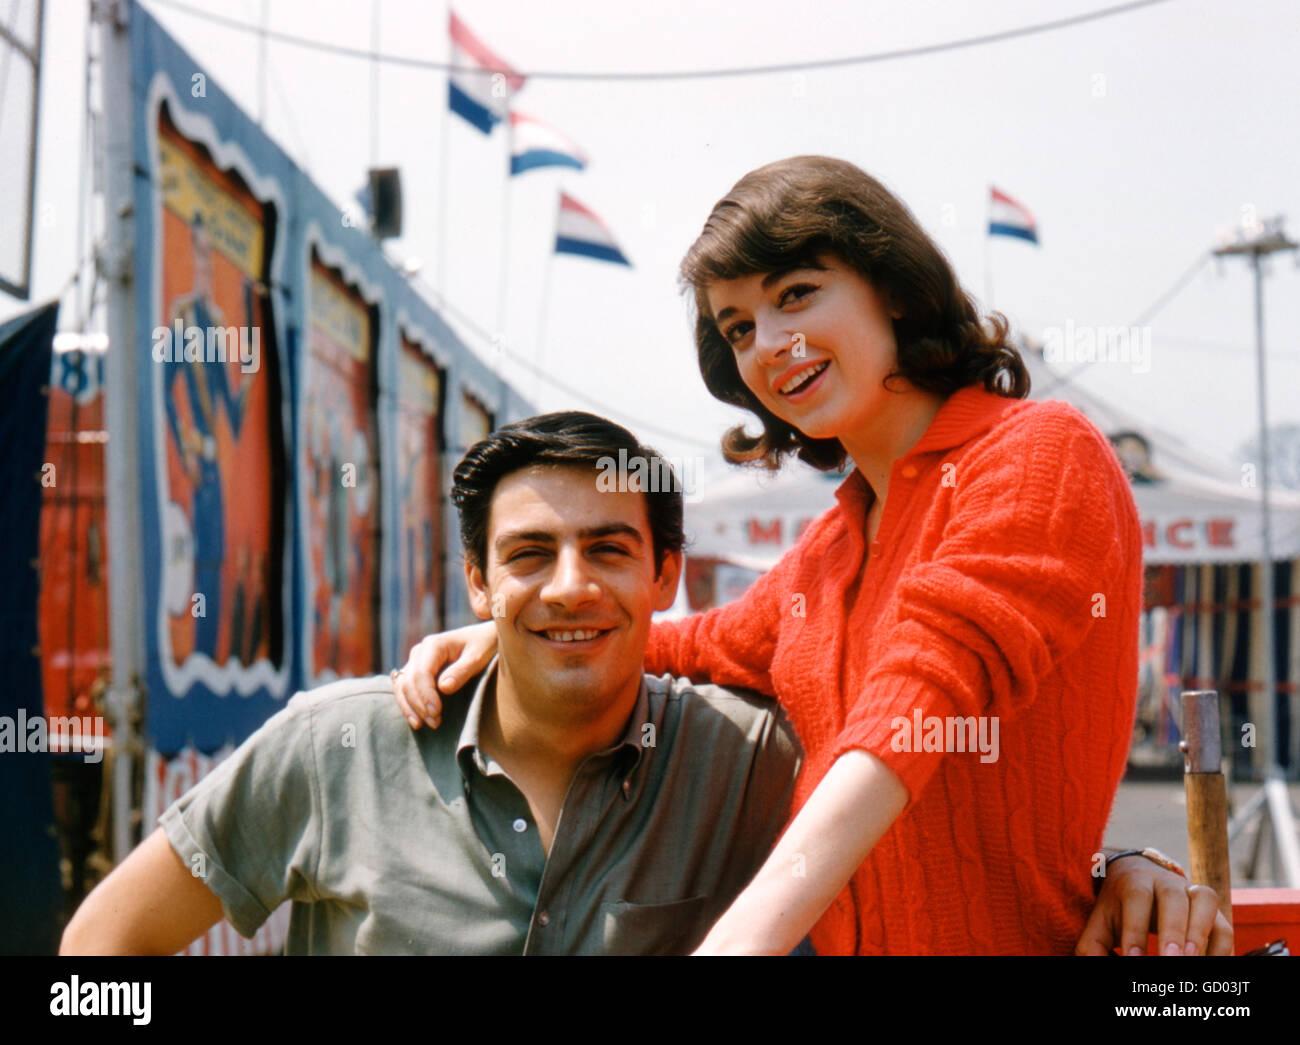 Anna Maria Alberghetti and Jerry Orbach - Stock Image